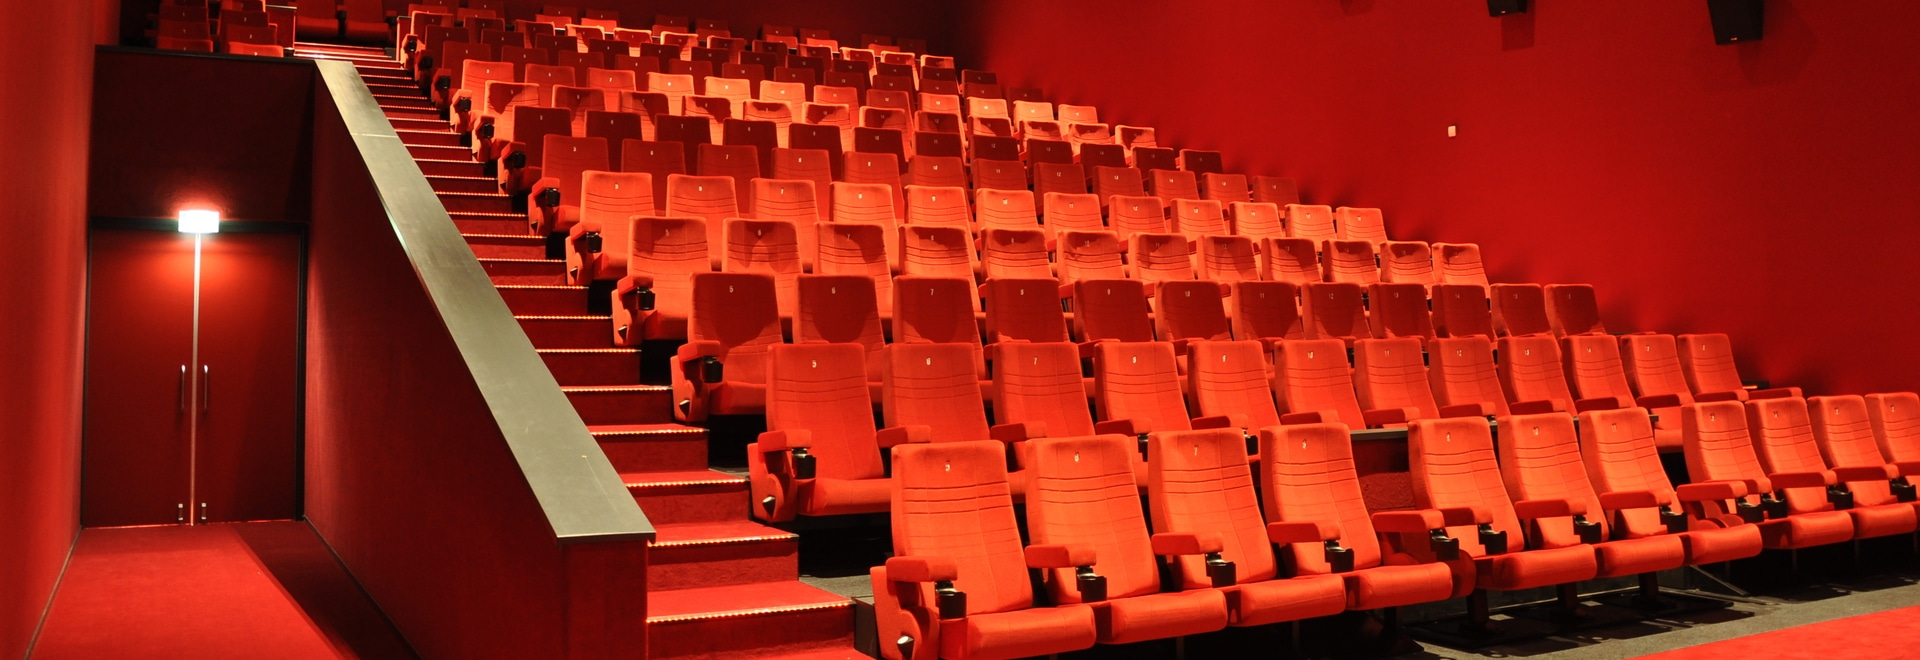 JT Cinema, The Netherlands